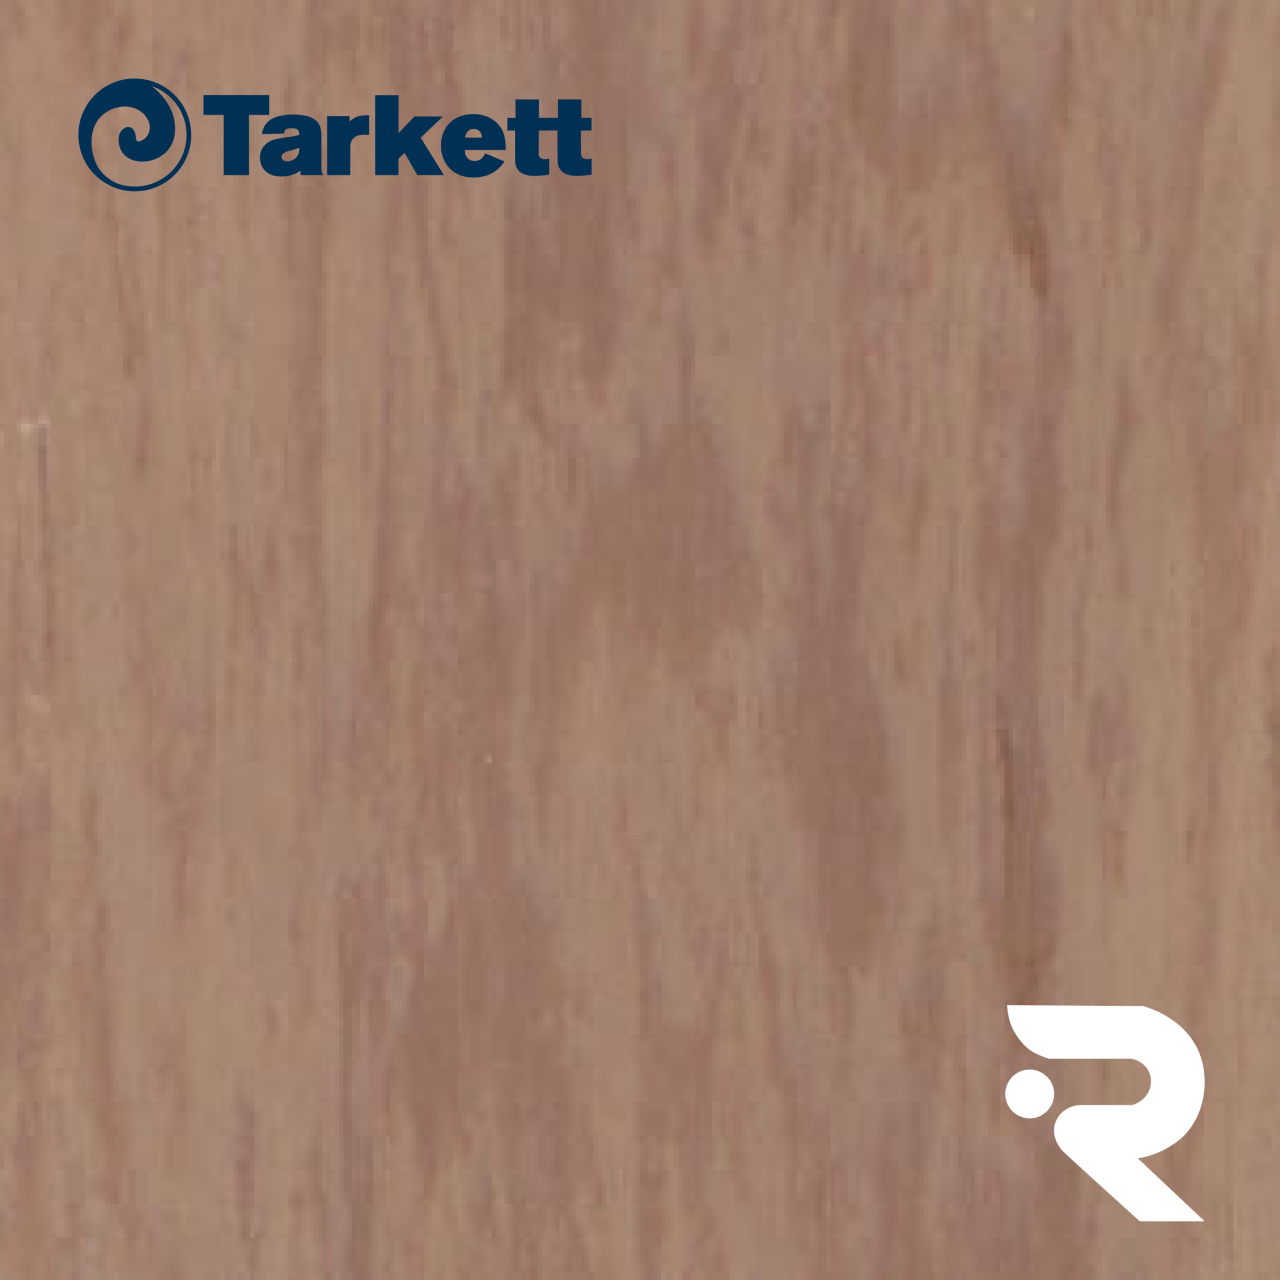 🏫 Гомогенний лінолеум Tarkett | Standard SAND DARK 0915 | Standard Plus 2.0 mm | 2 х 23 м